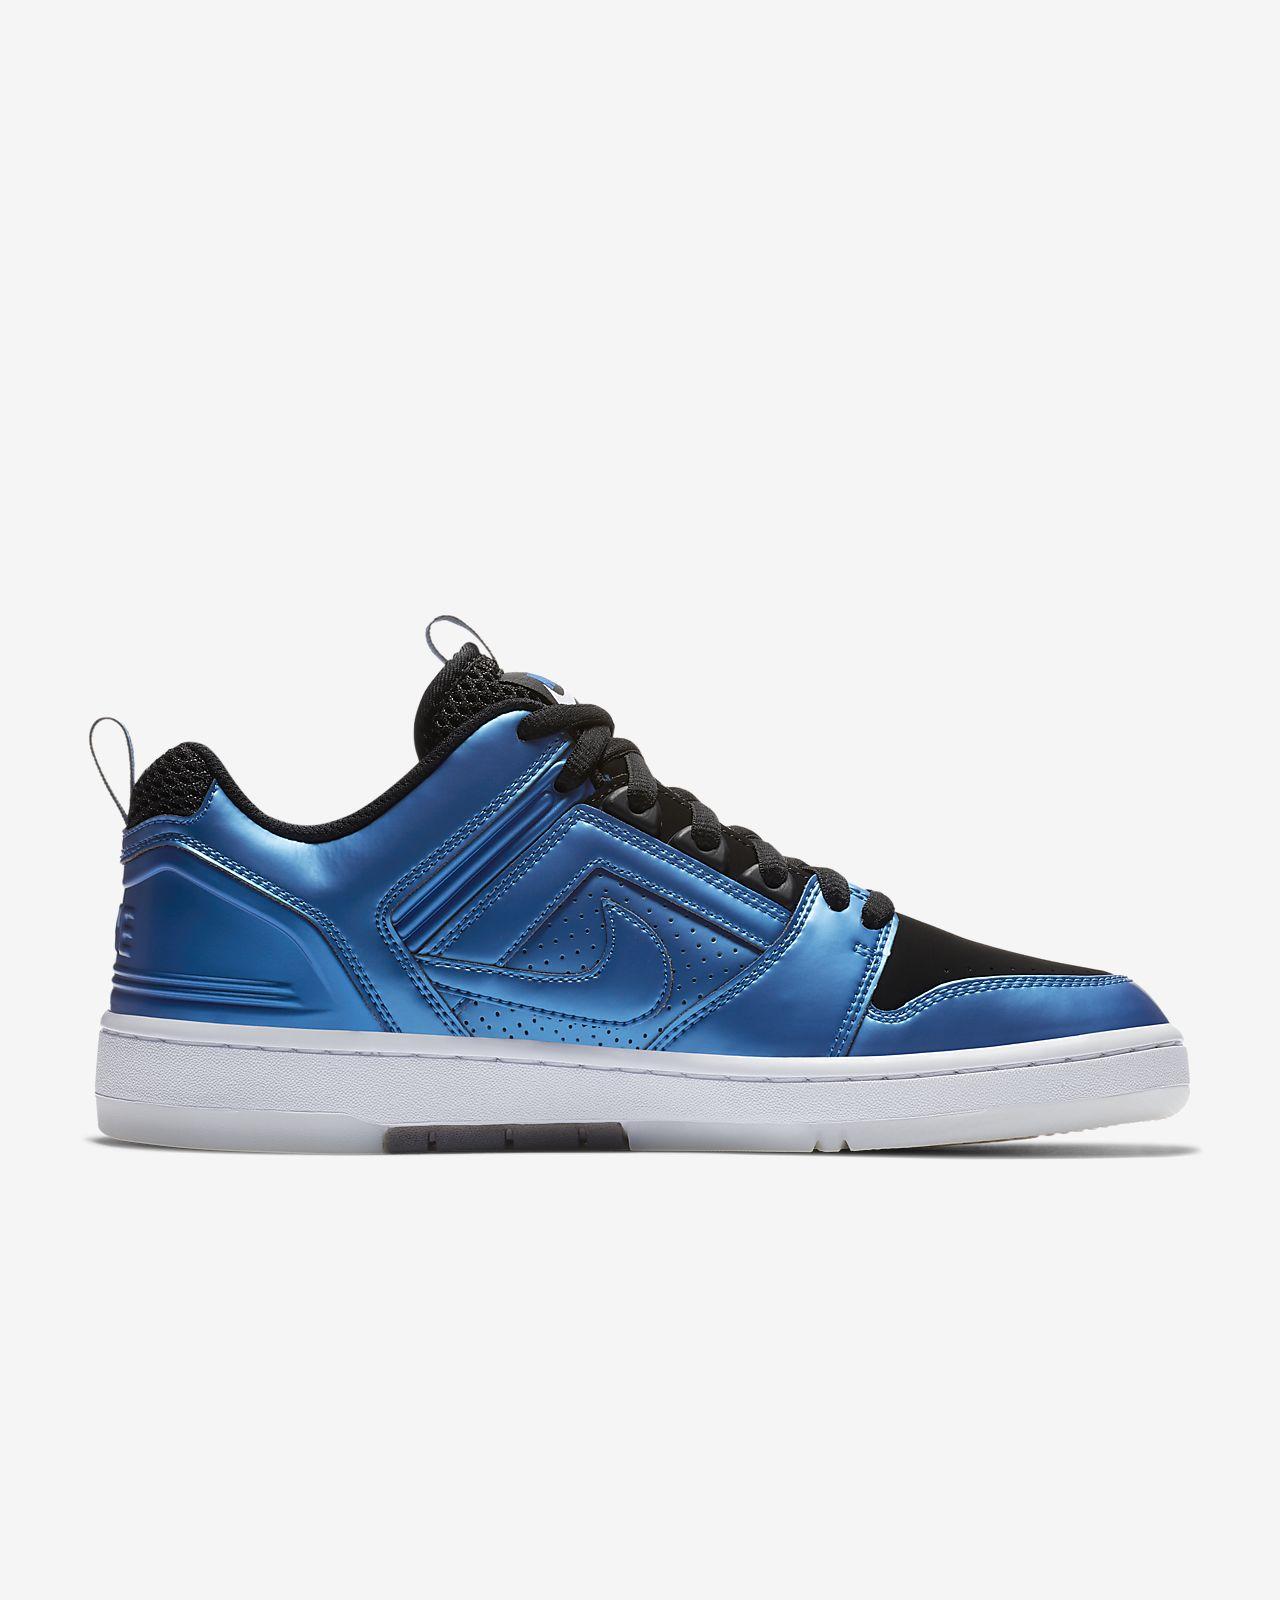 1c507132654 Nike SB Air Force 2 Low Men s Skate Shoe. Nike.com SG